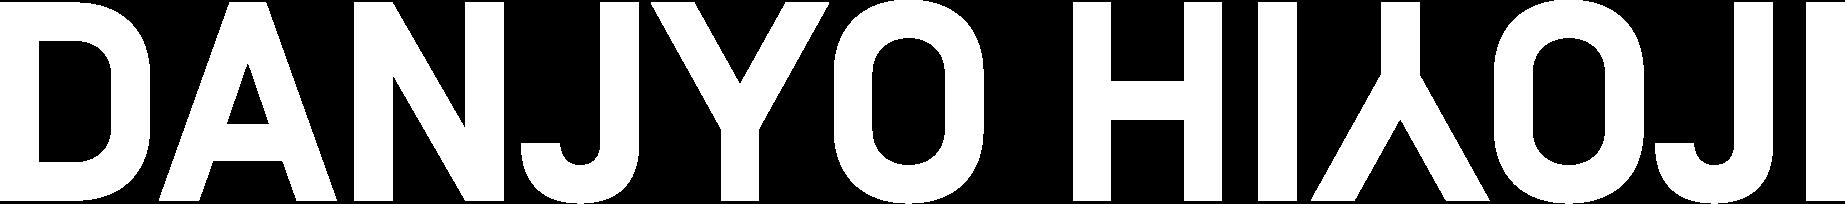 Logo Danjyo Hiyoji